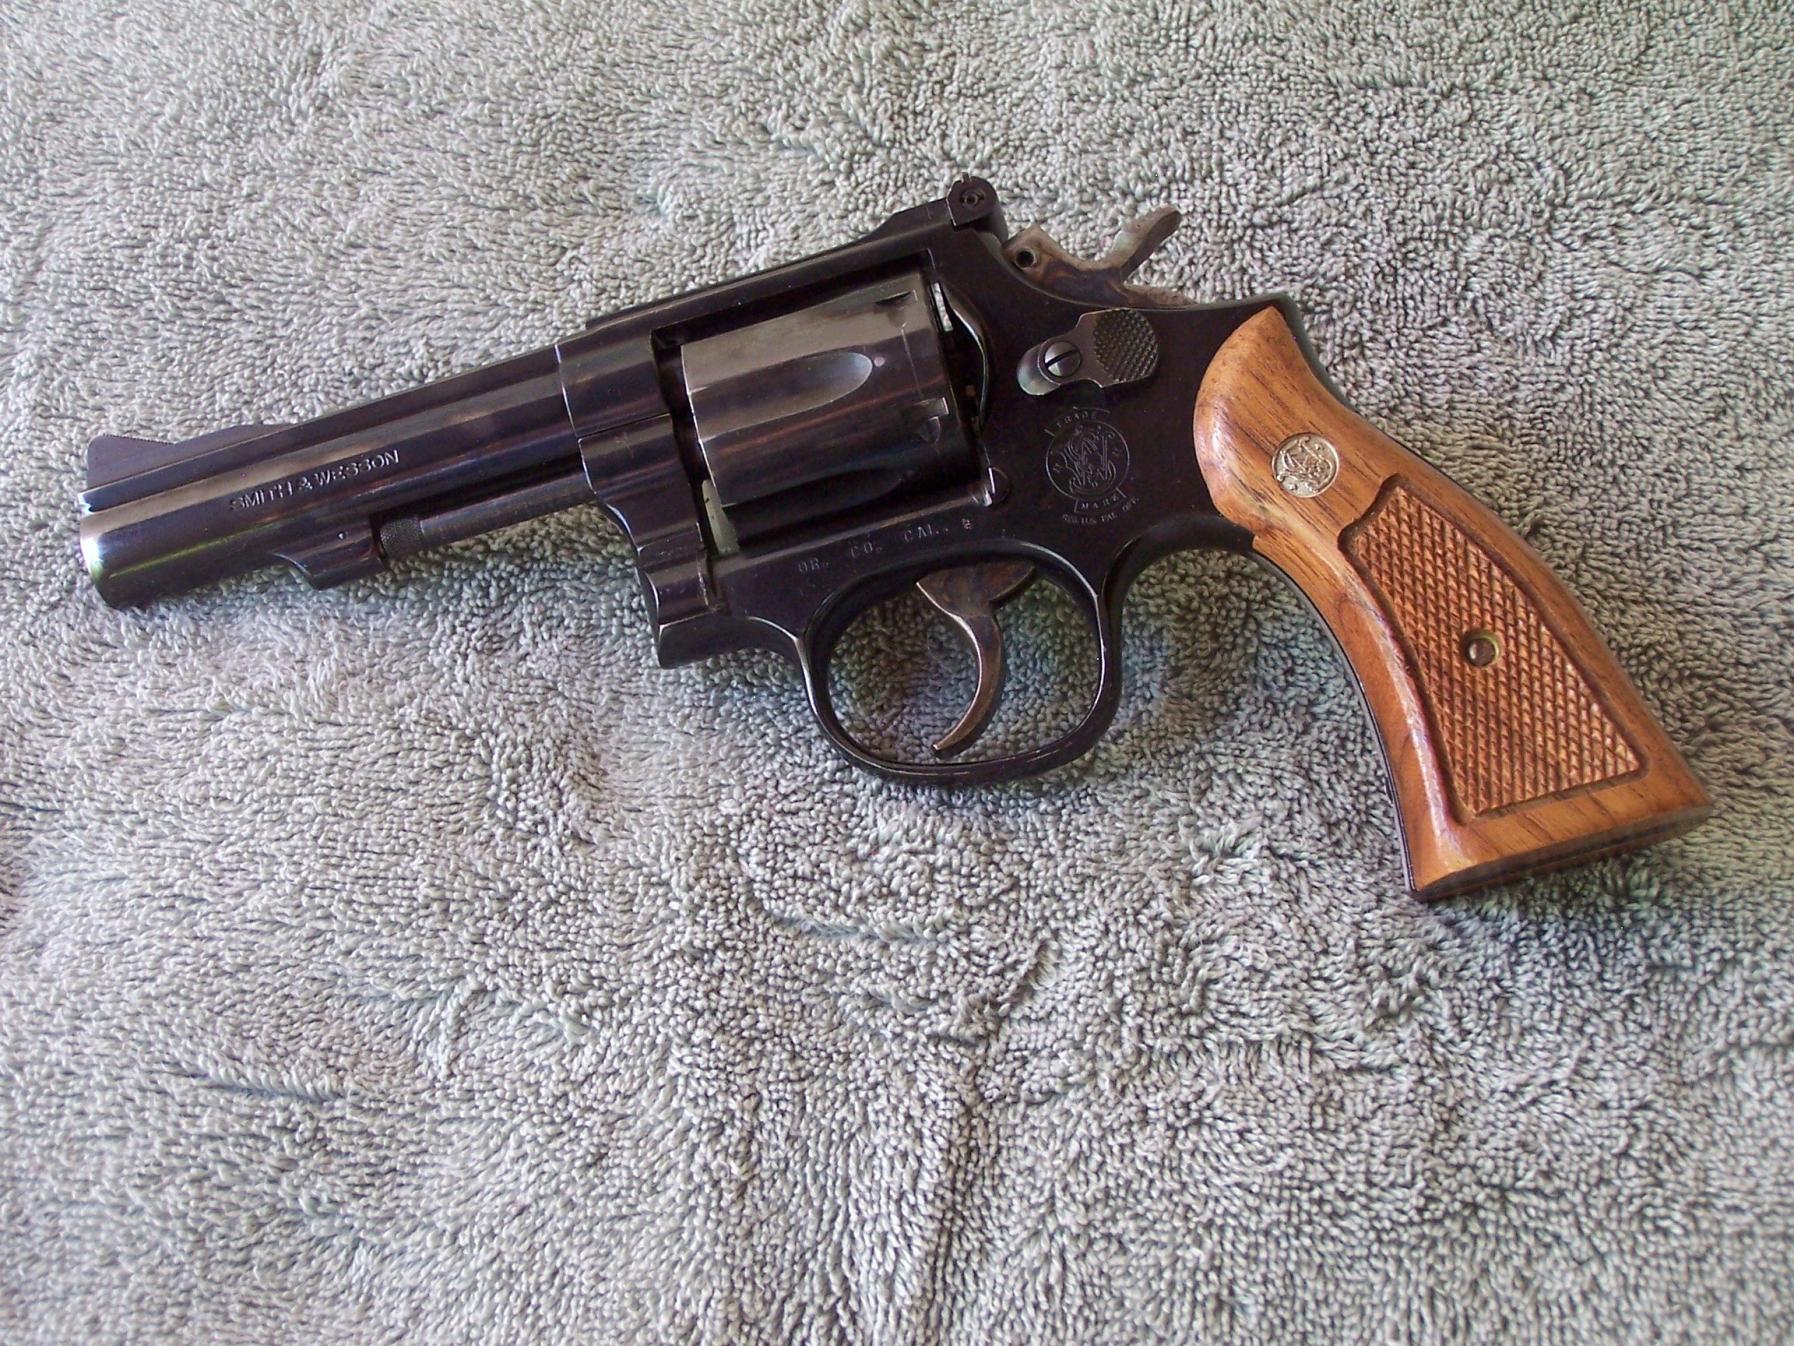 Revolver-auh8483.jpg